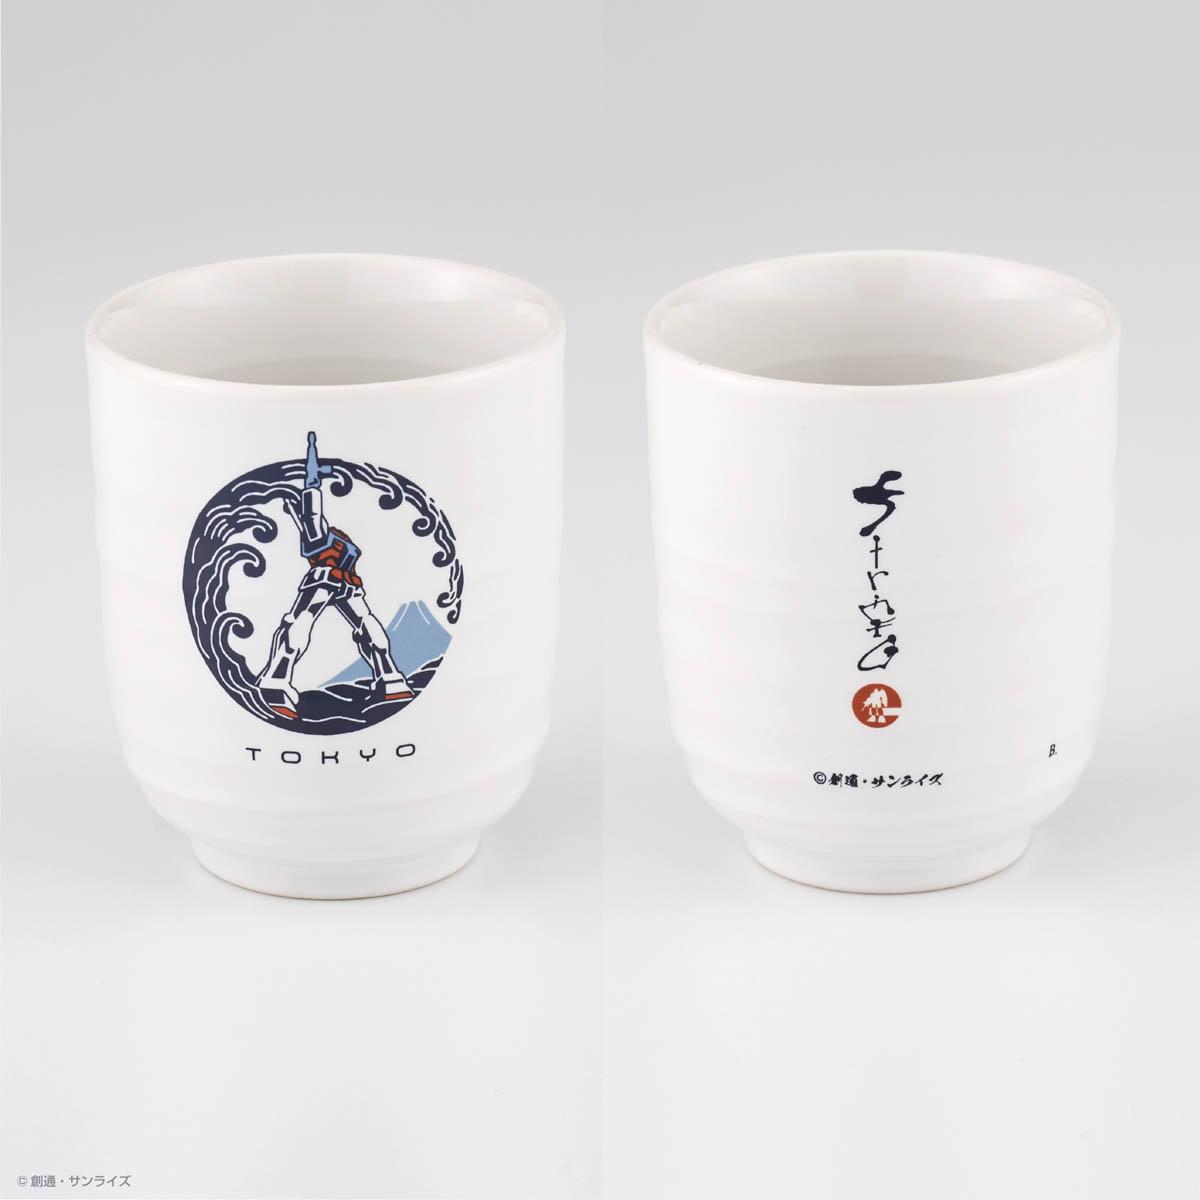 STRICT-G JAPANより紋様柄シリーズ発売!